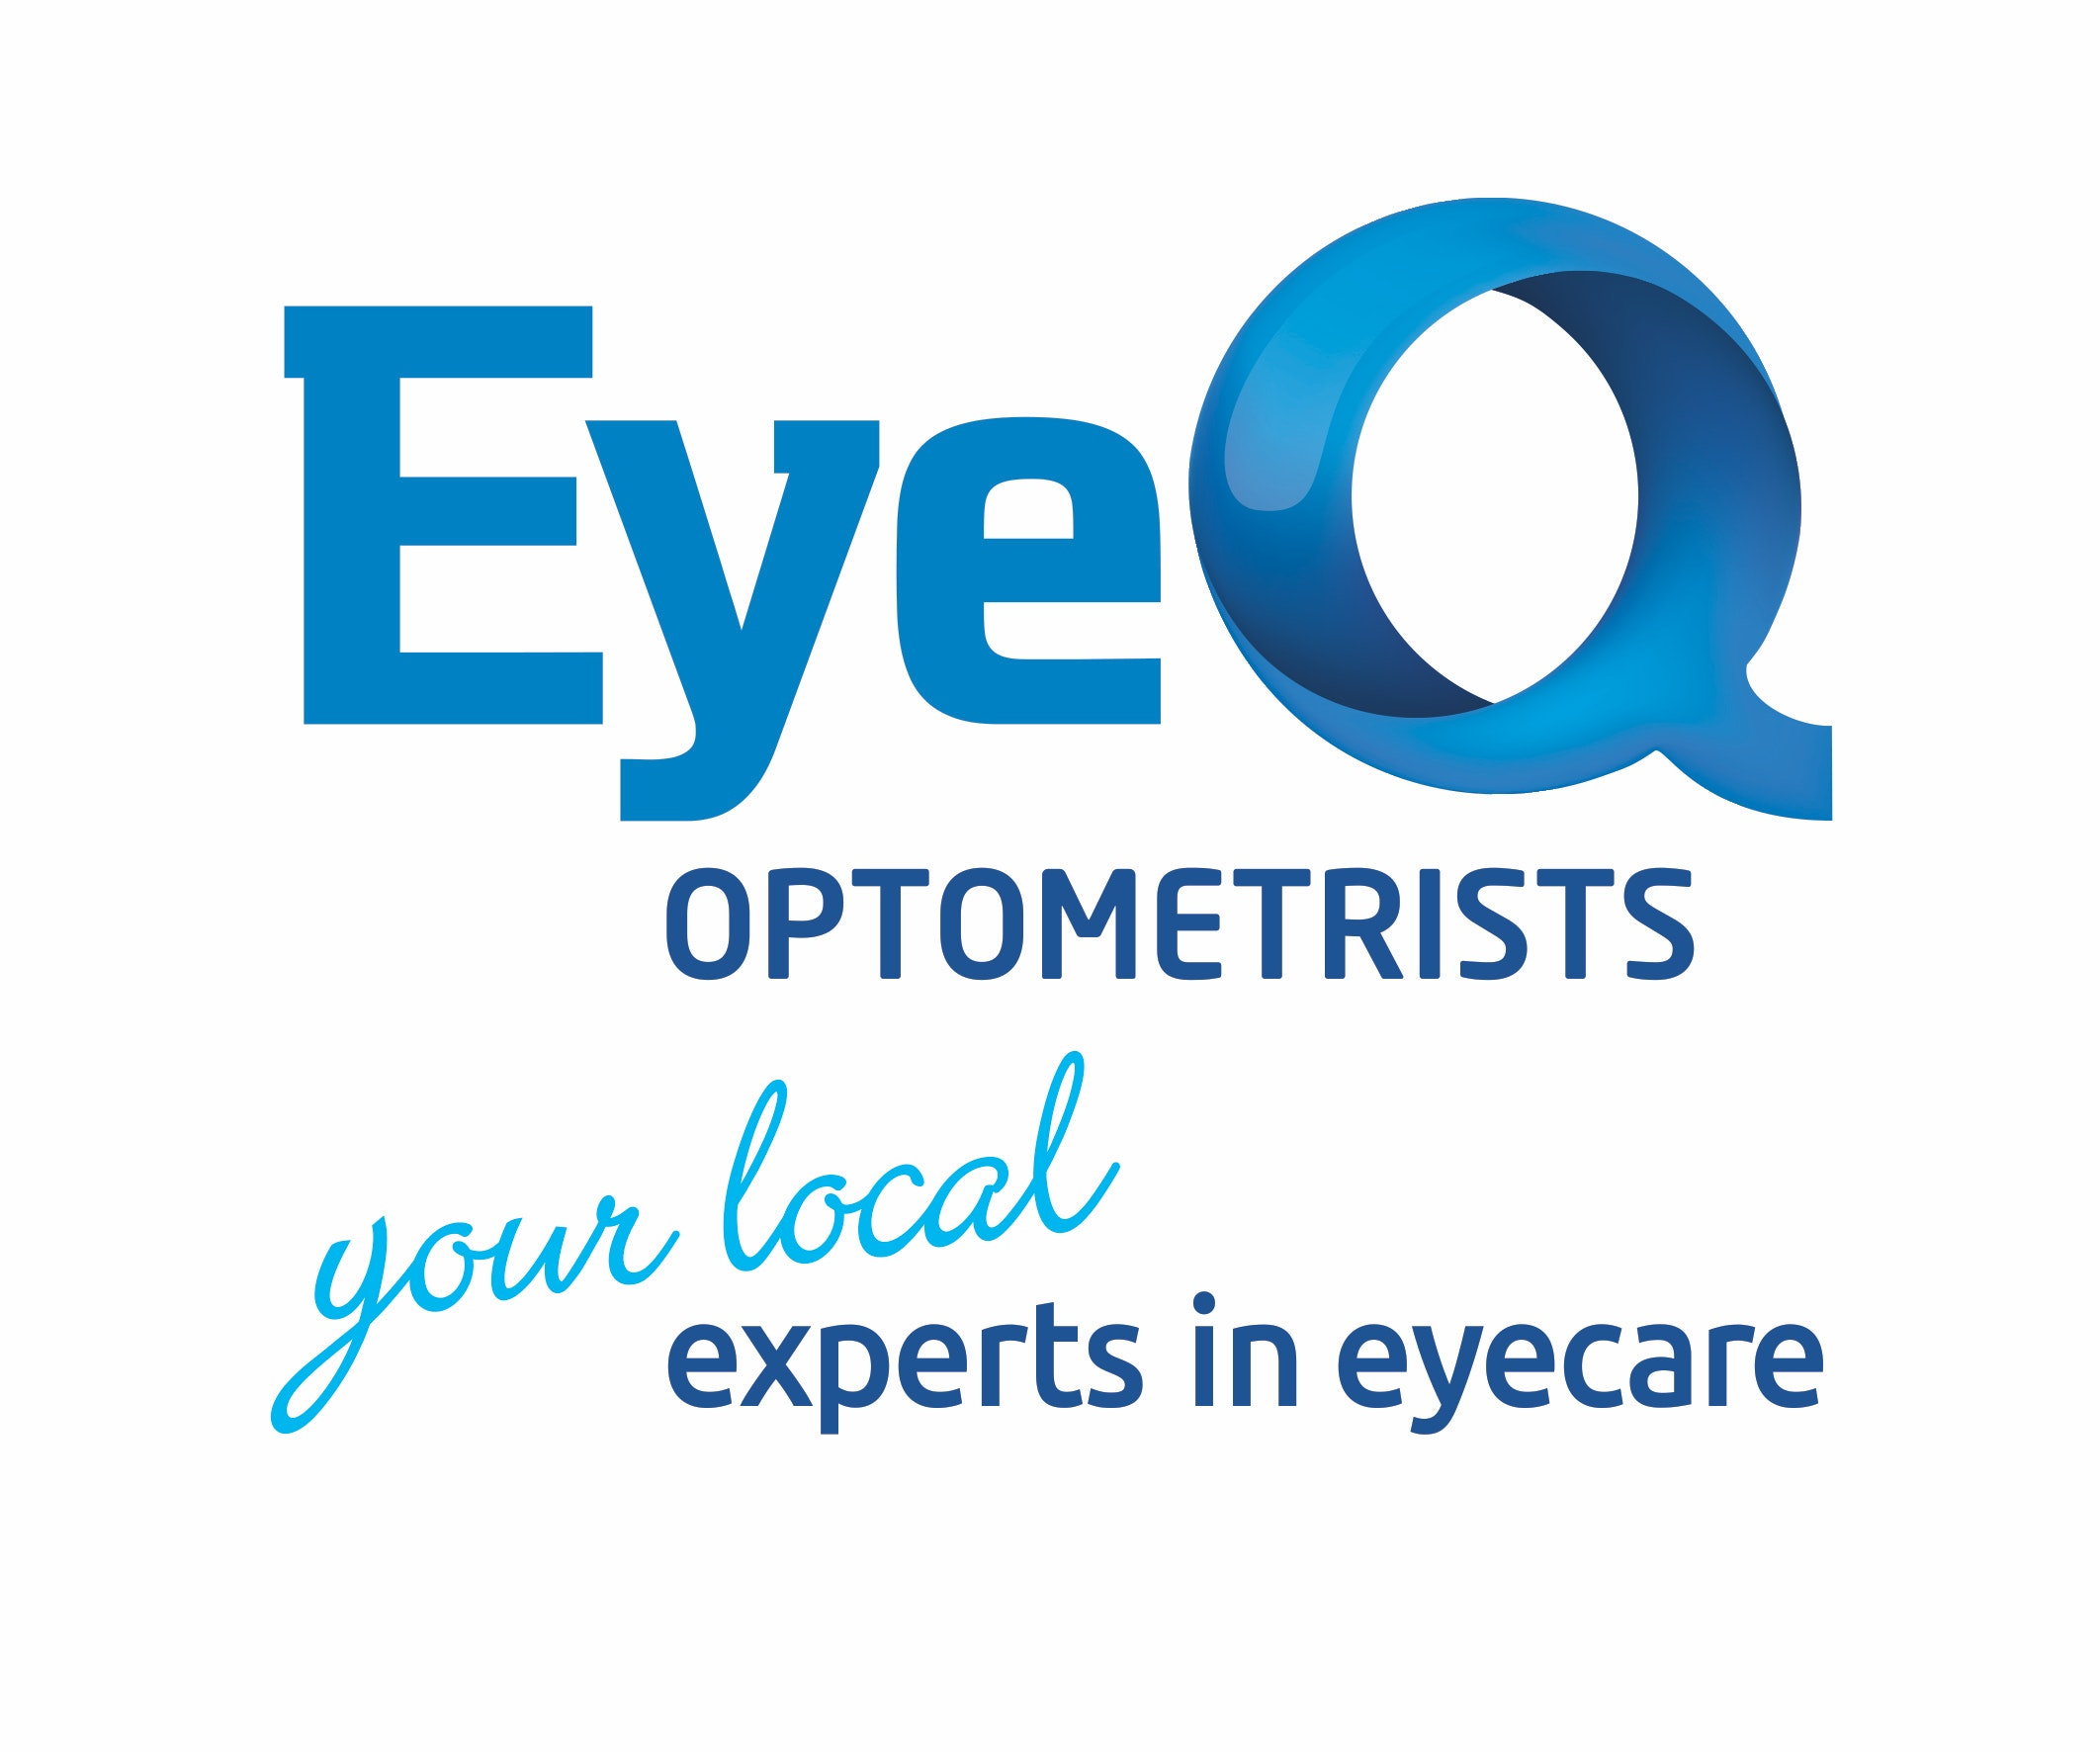 logo for EyeQ Optometrists Newton Optometrists